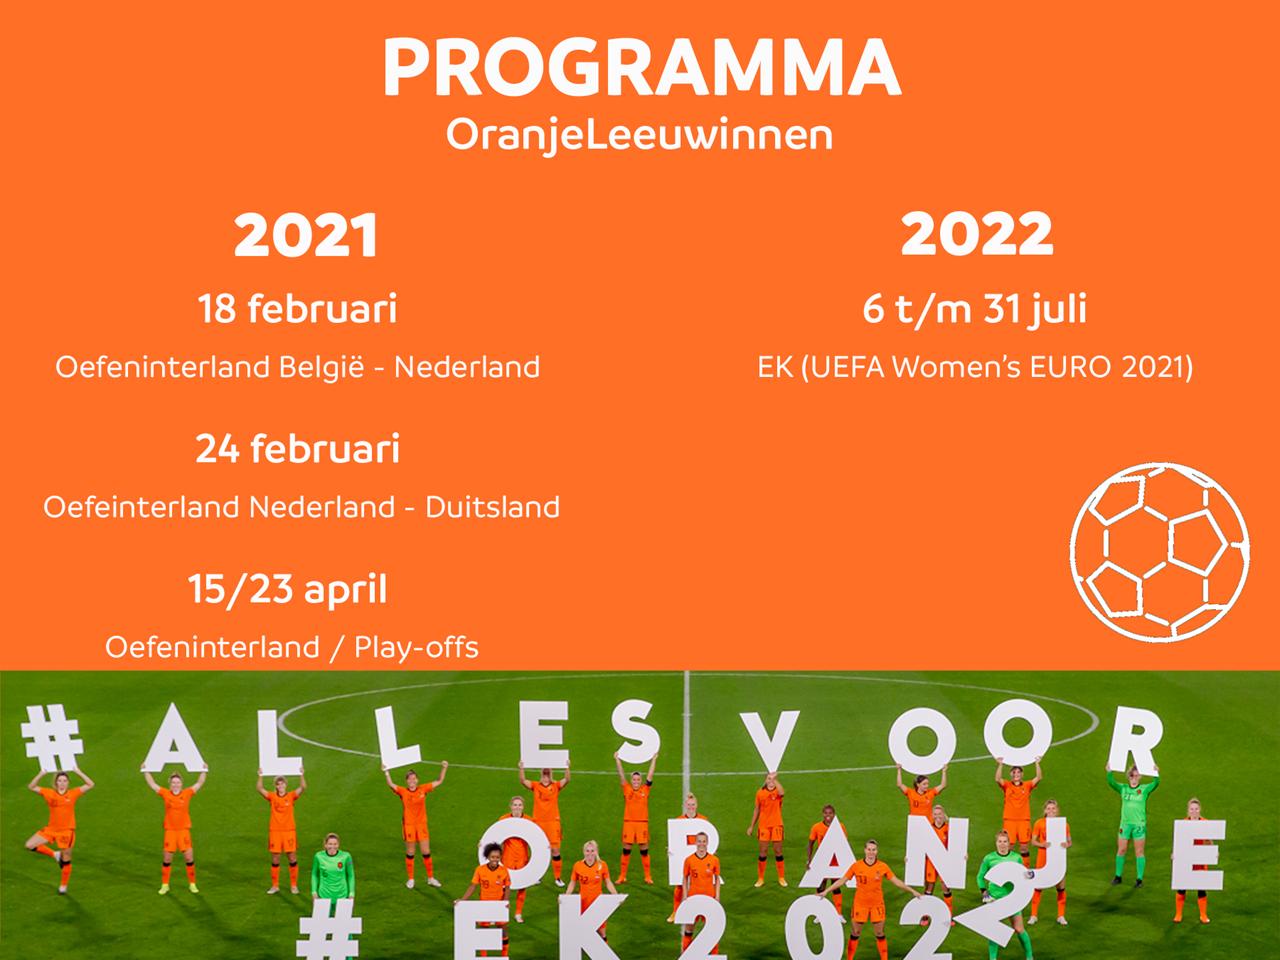 Programma-OranjeLeeuwinnen-Zoover-Sports-Events-(1).png